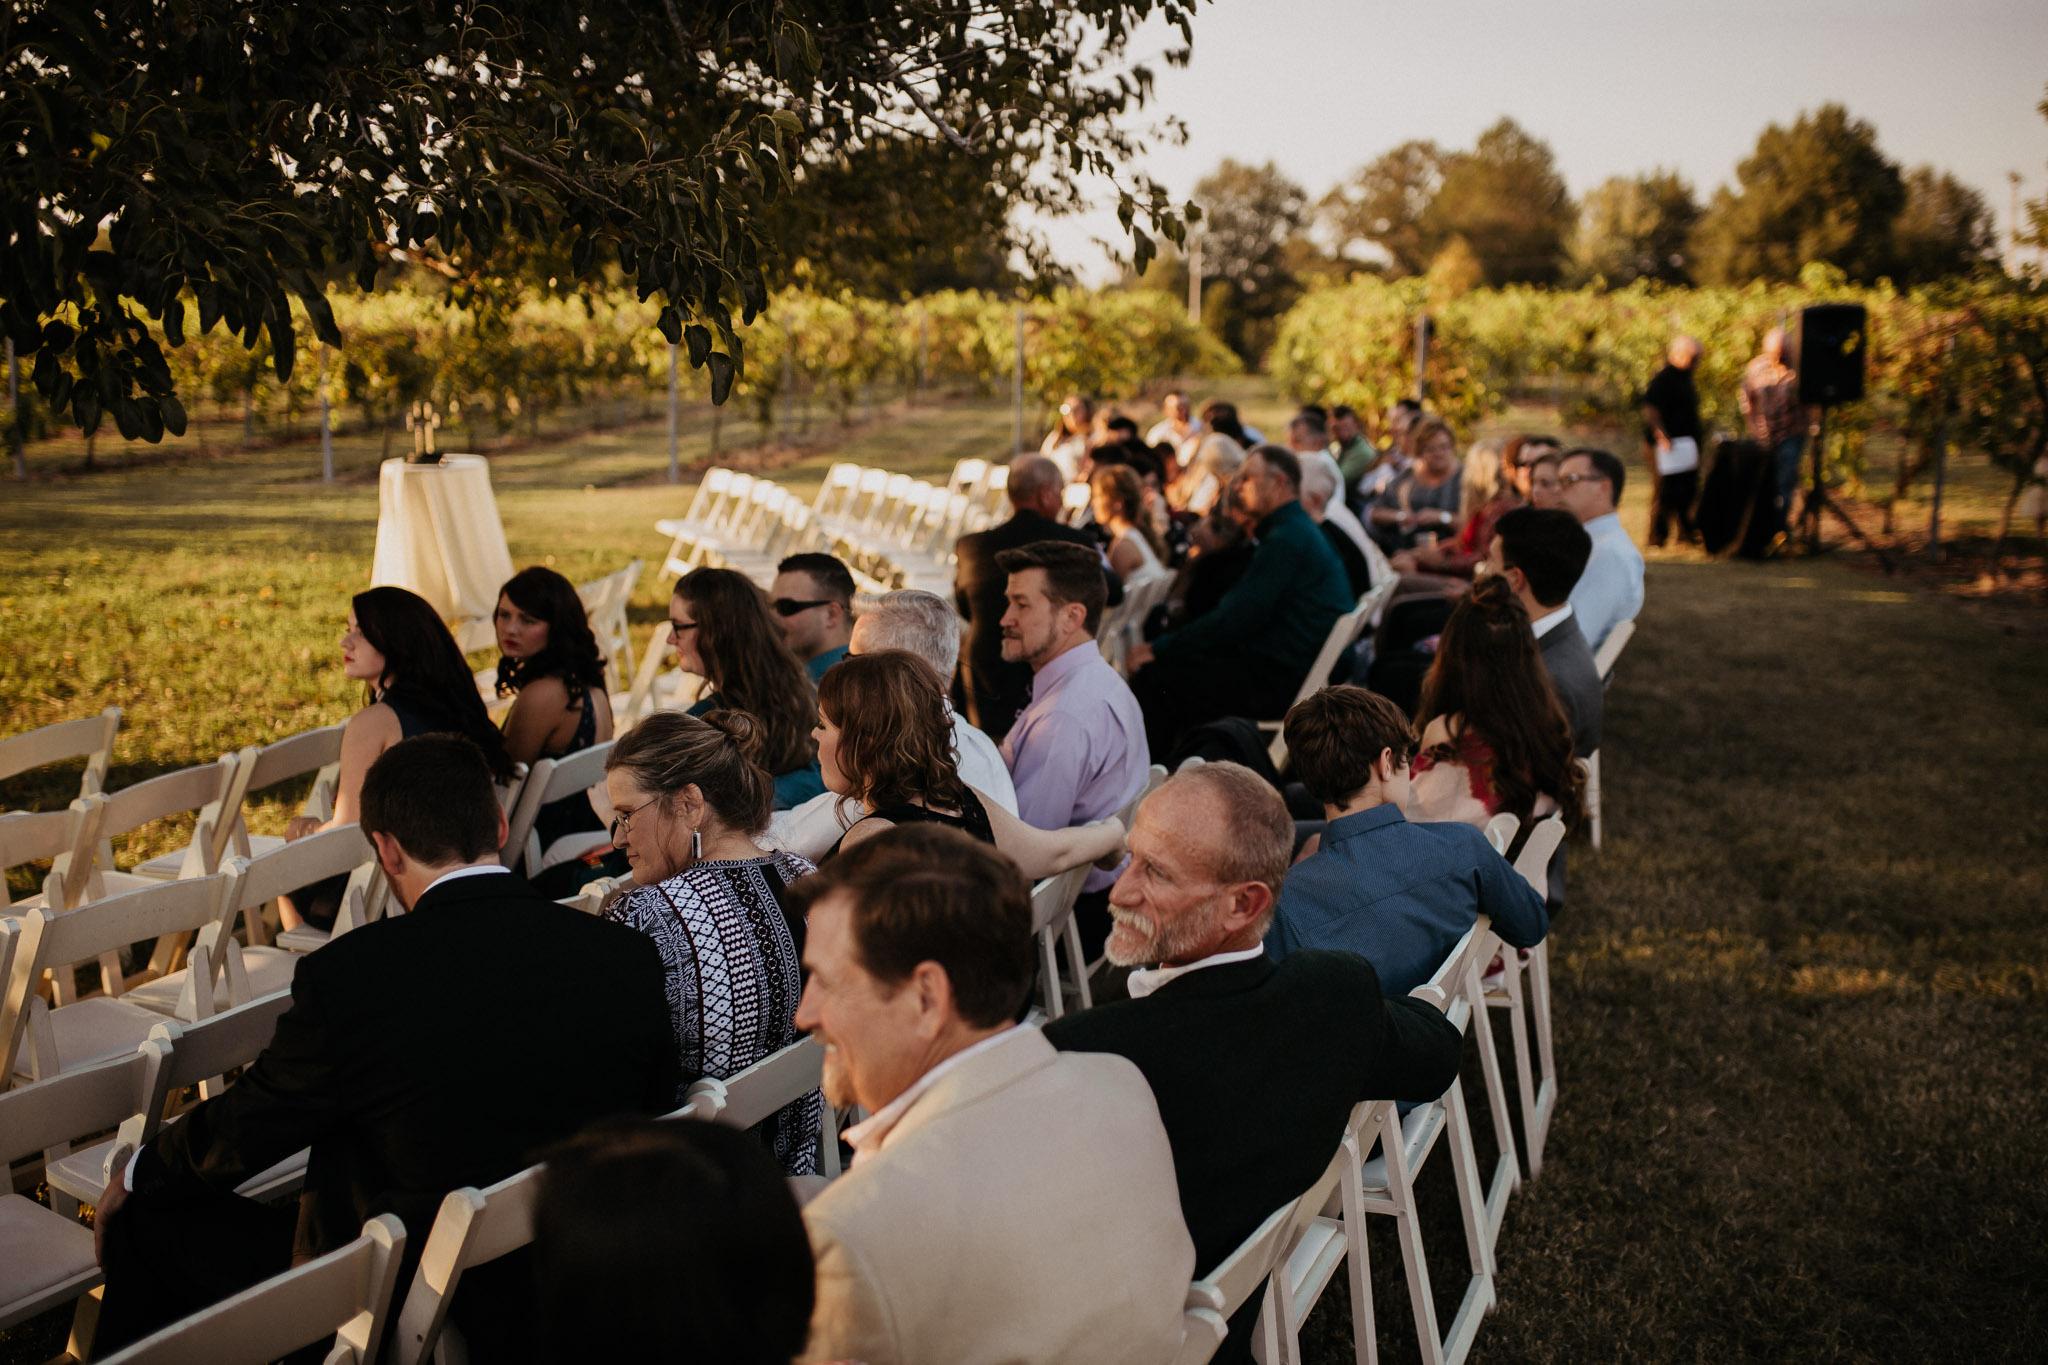 memphis-gatlinburg-nashville-tennessee-wedding-photographer-the-hatches-utah-colorado-washington-arizona-oregon-yosemite-national-park-elopement-adventure-emotional-journalistic-bohemian-florals-minimalistic-winery-elegant